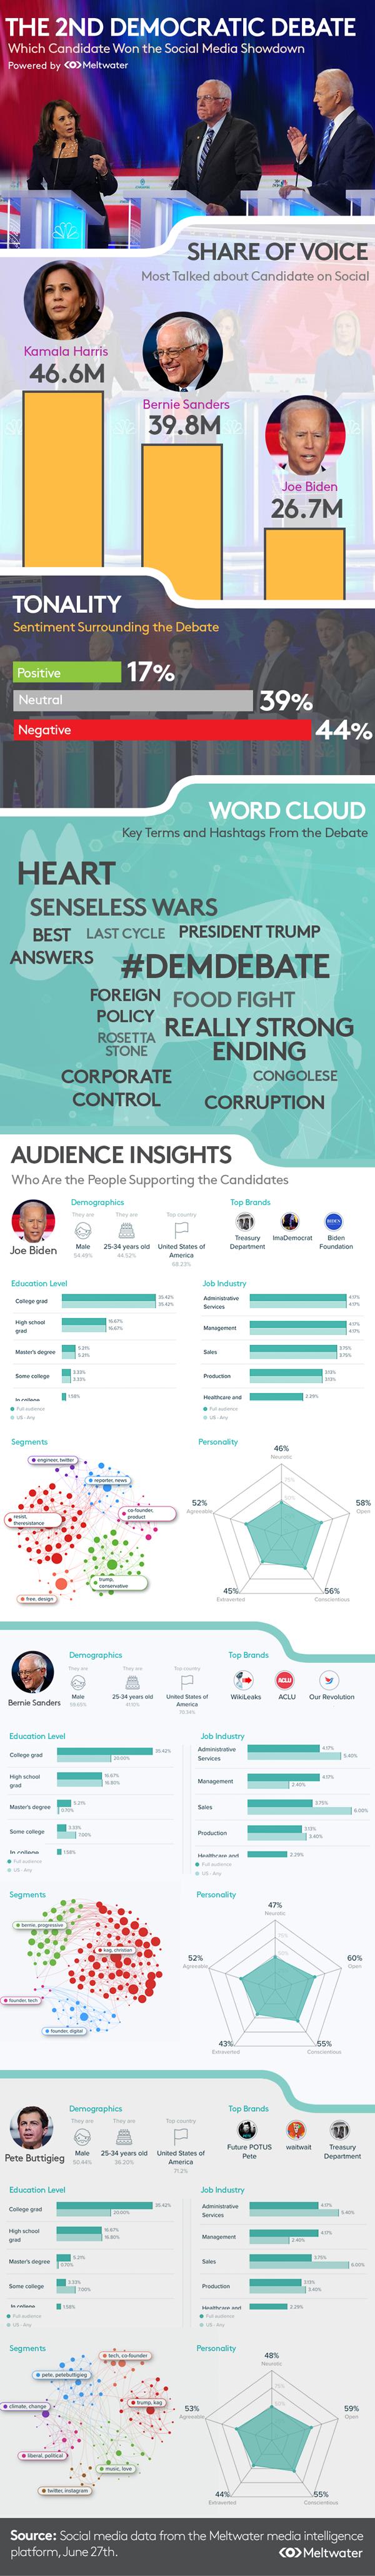 Infographic-Democratic-Debate-6-2019.png